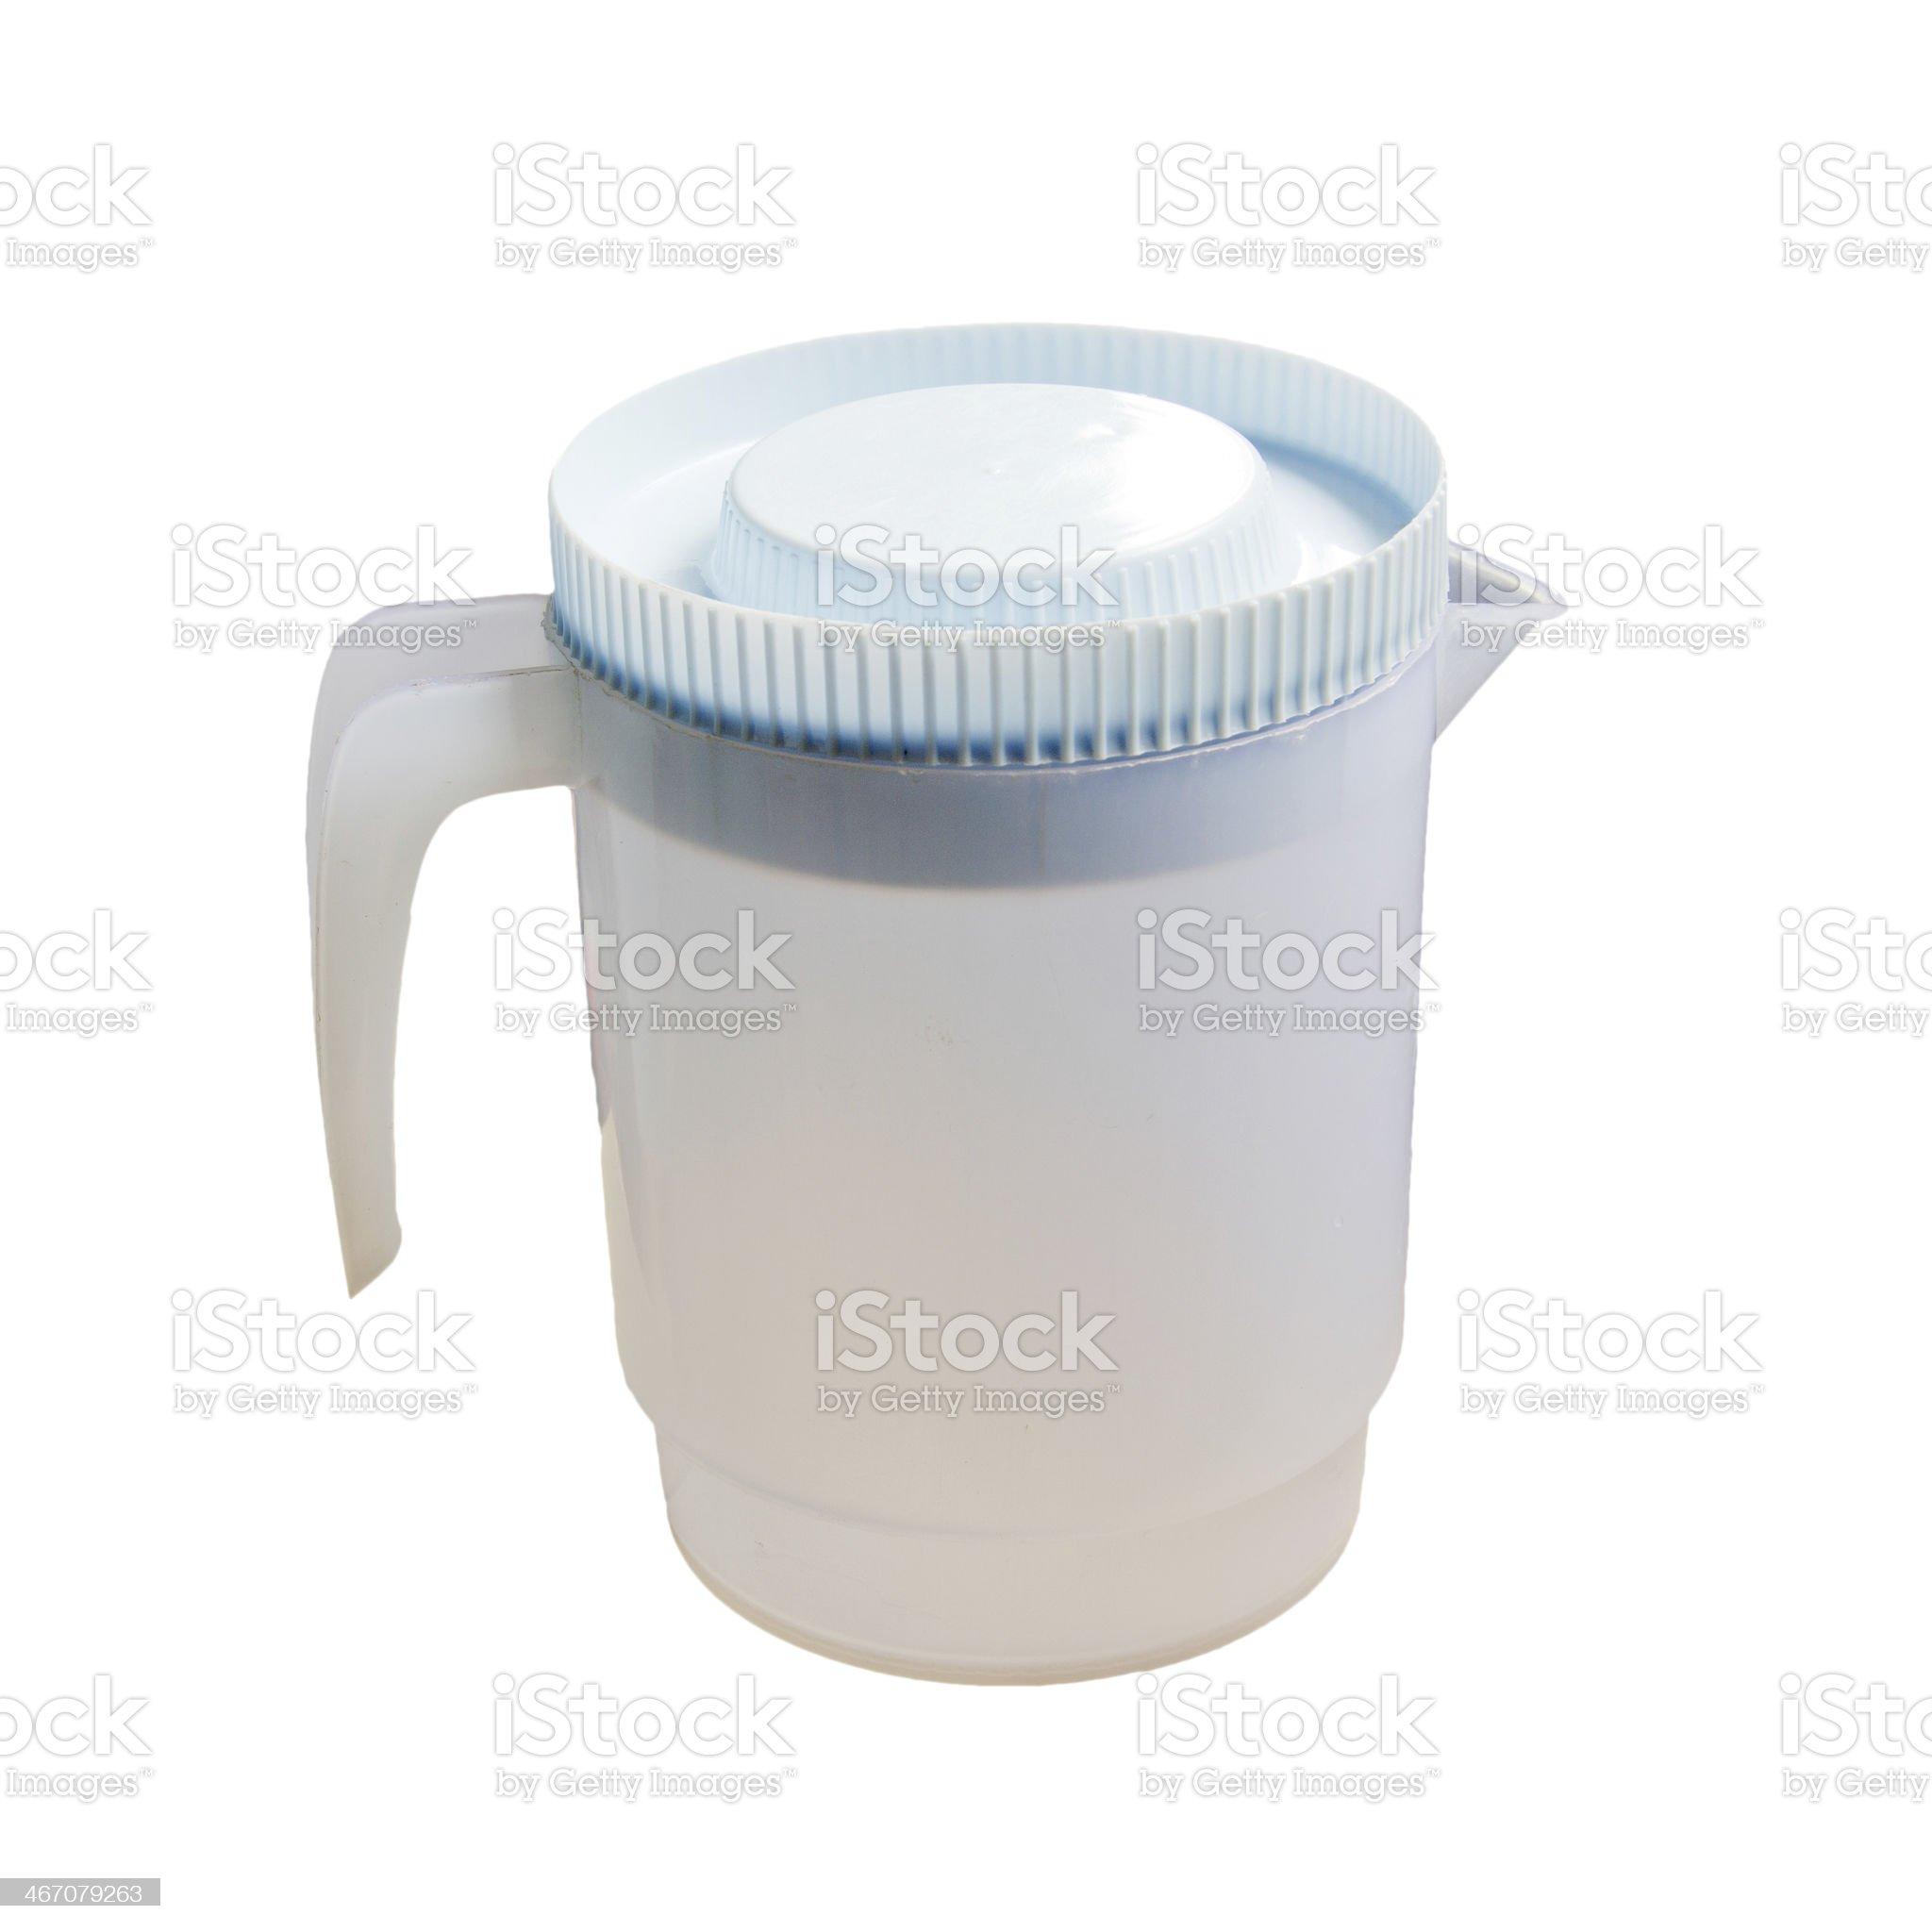 Plastic pitcher. royalty-free stock photo